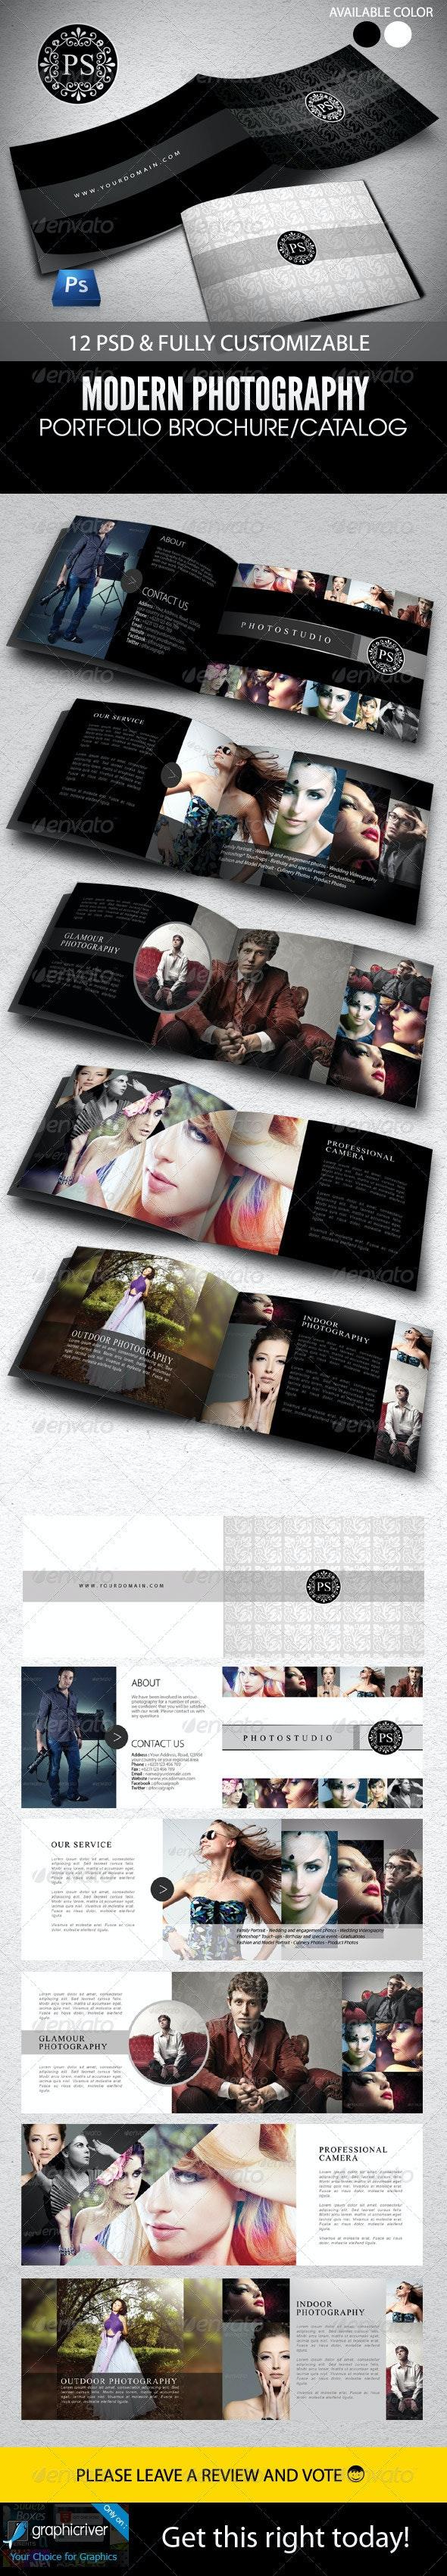 Modern Portfolio Brochure or Catalog  - Portfolio Brochures